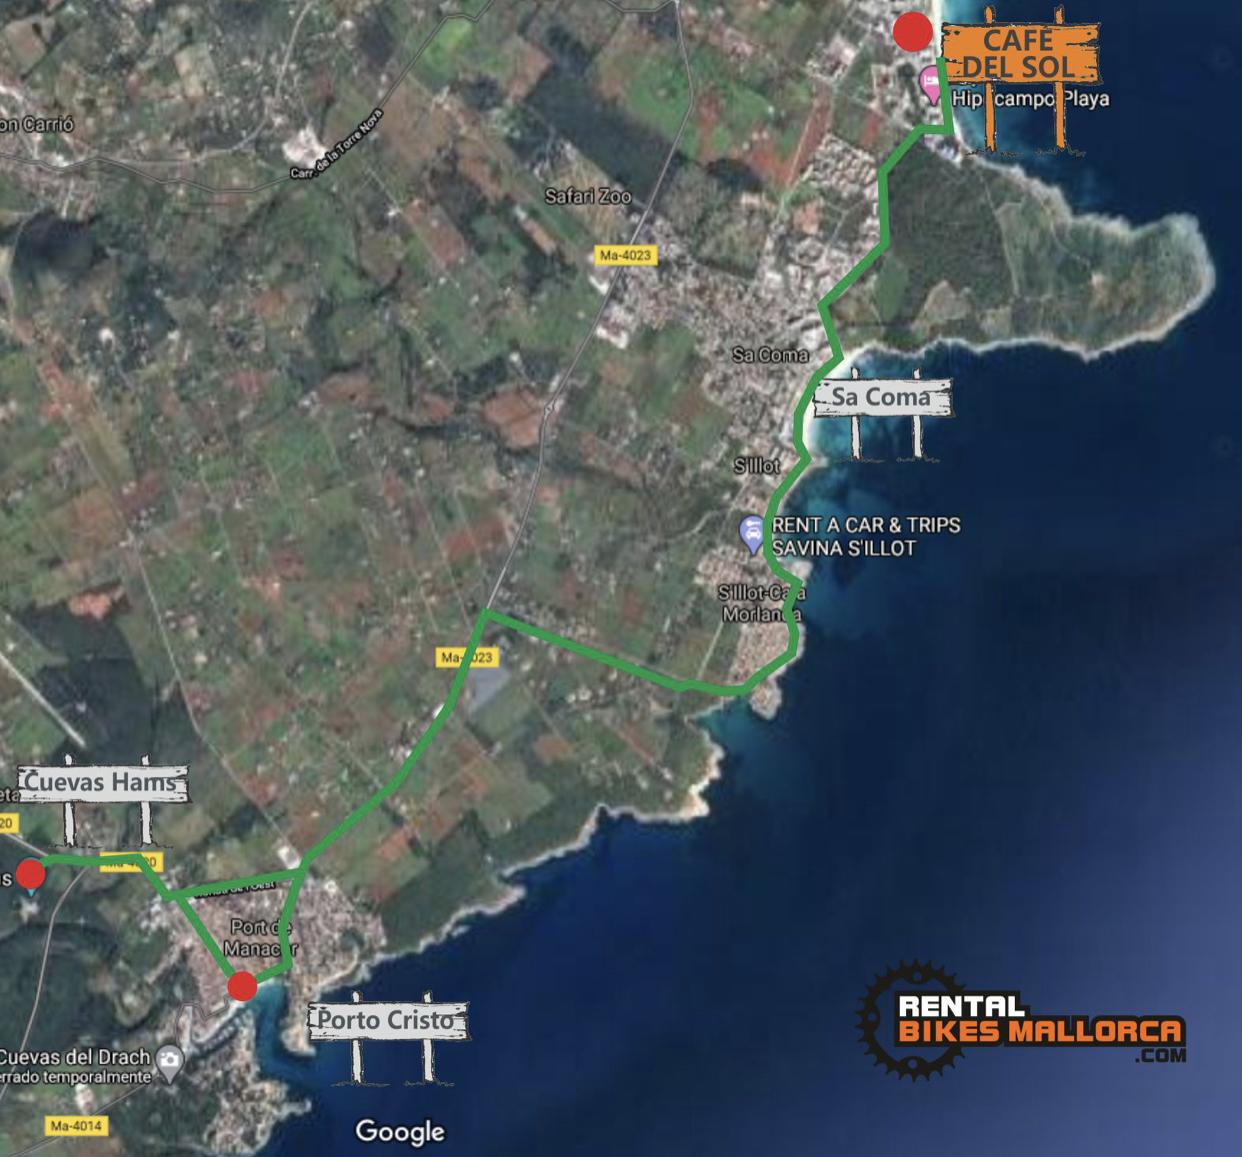 Alquiler de bicicletas.Mapa Porto Cristo cuevas Hams.IMG